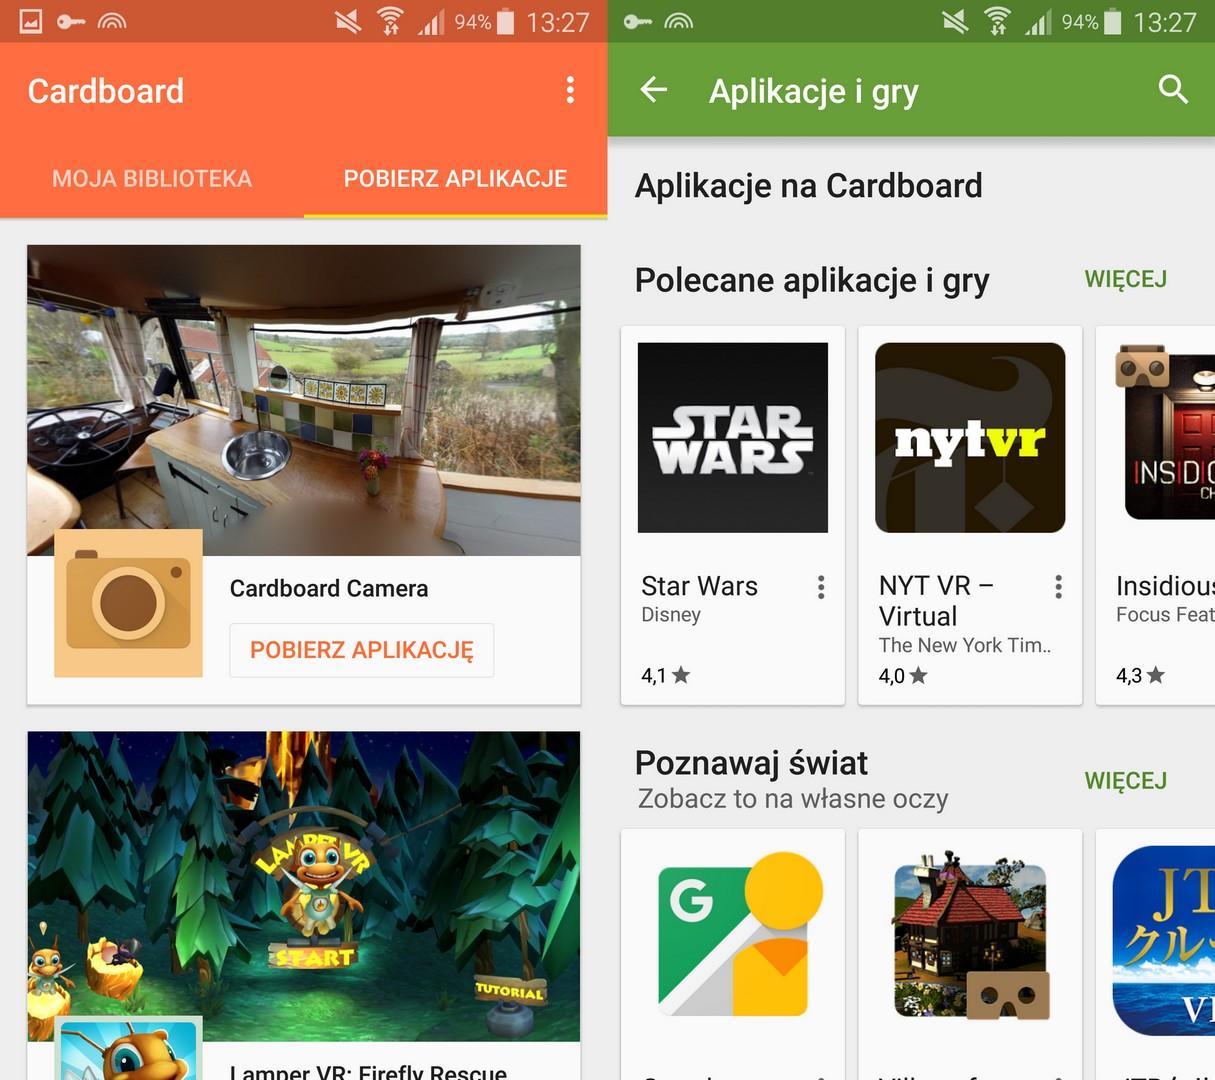 Obsługa Gogli Vr Oculus Vs Cardboard Cardboard Google